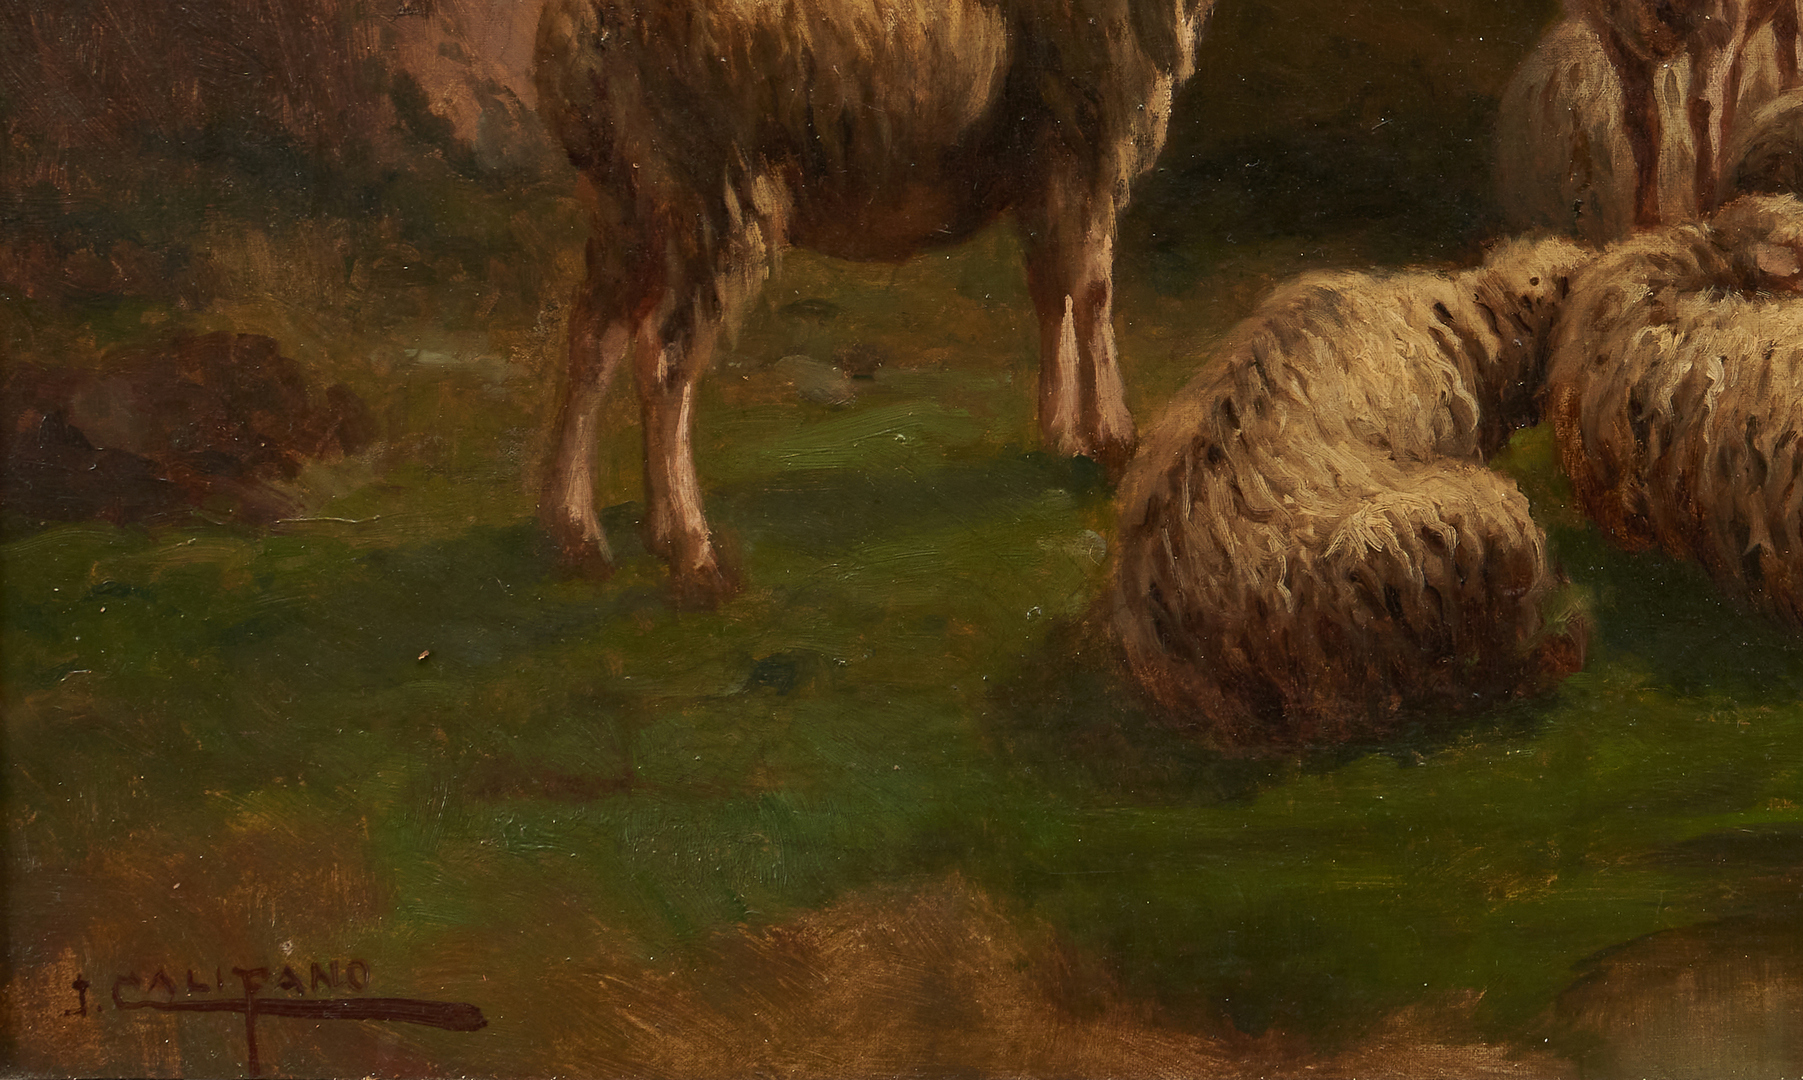 Lot 757: J. Califano O/B Landscape Painting of Sheep